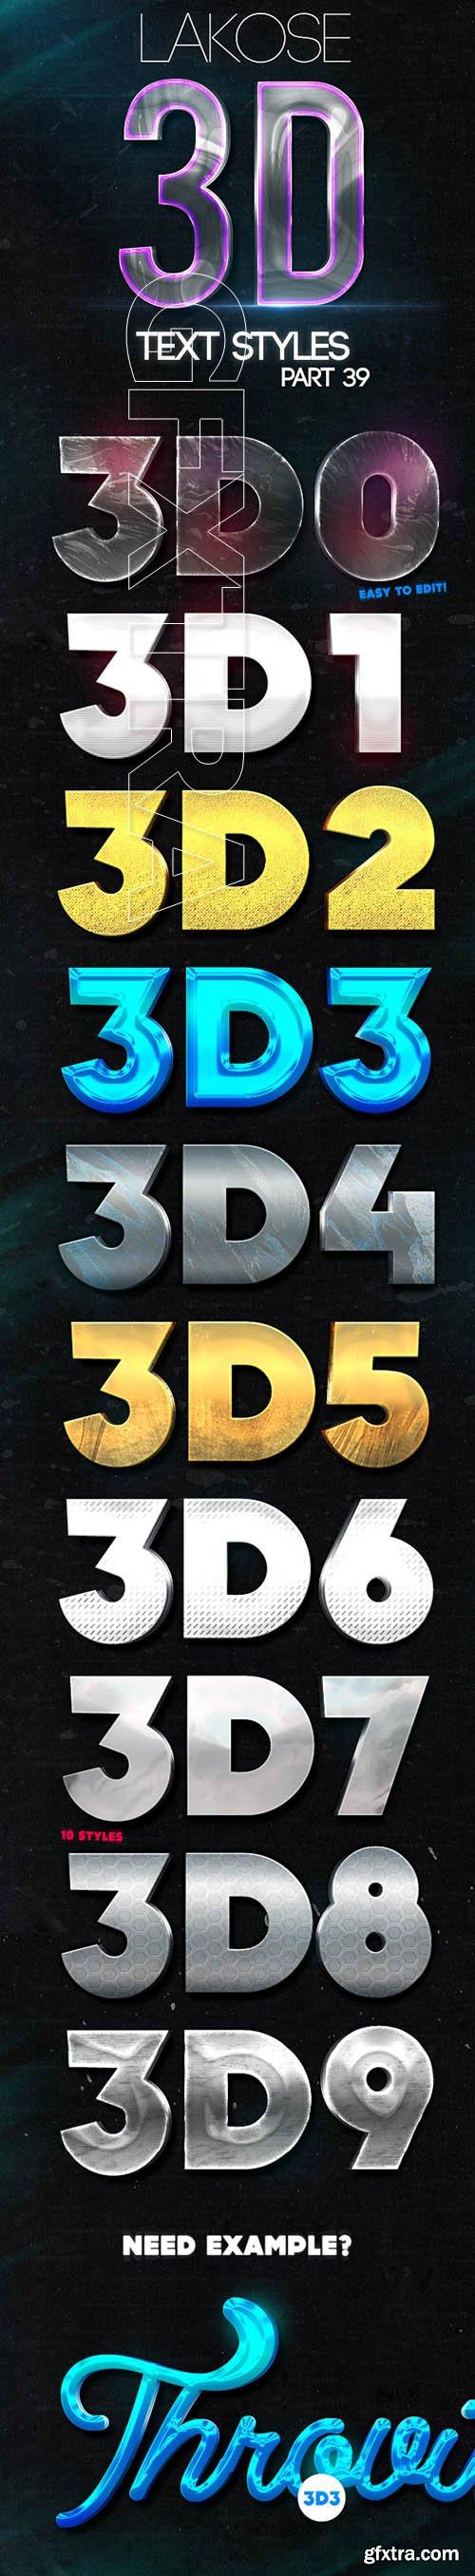 GraphicRiver - Lakose 3D Text Styles Part 39 22644984